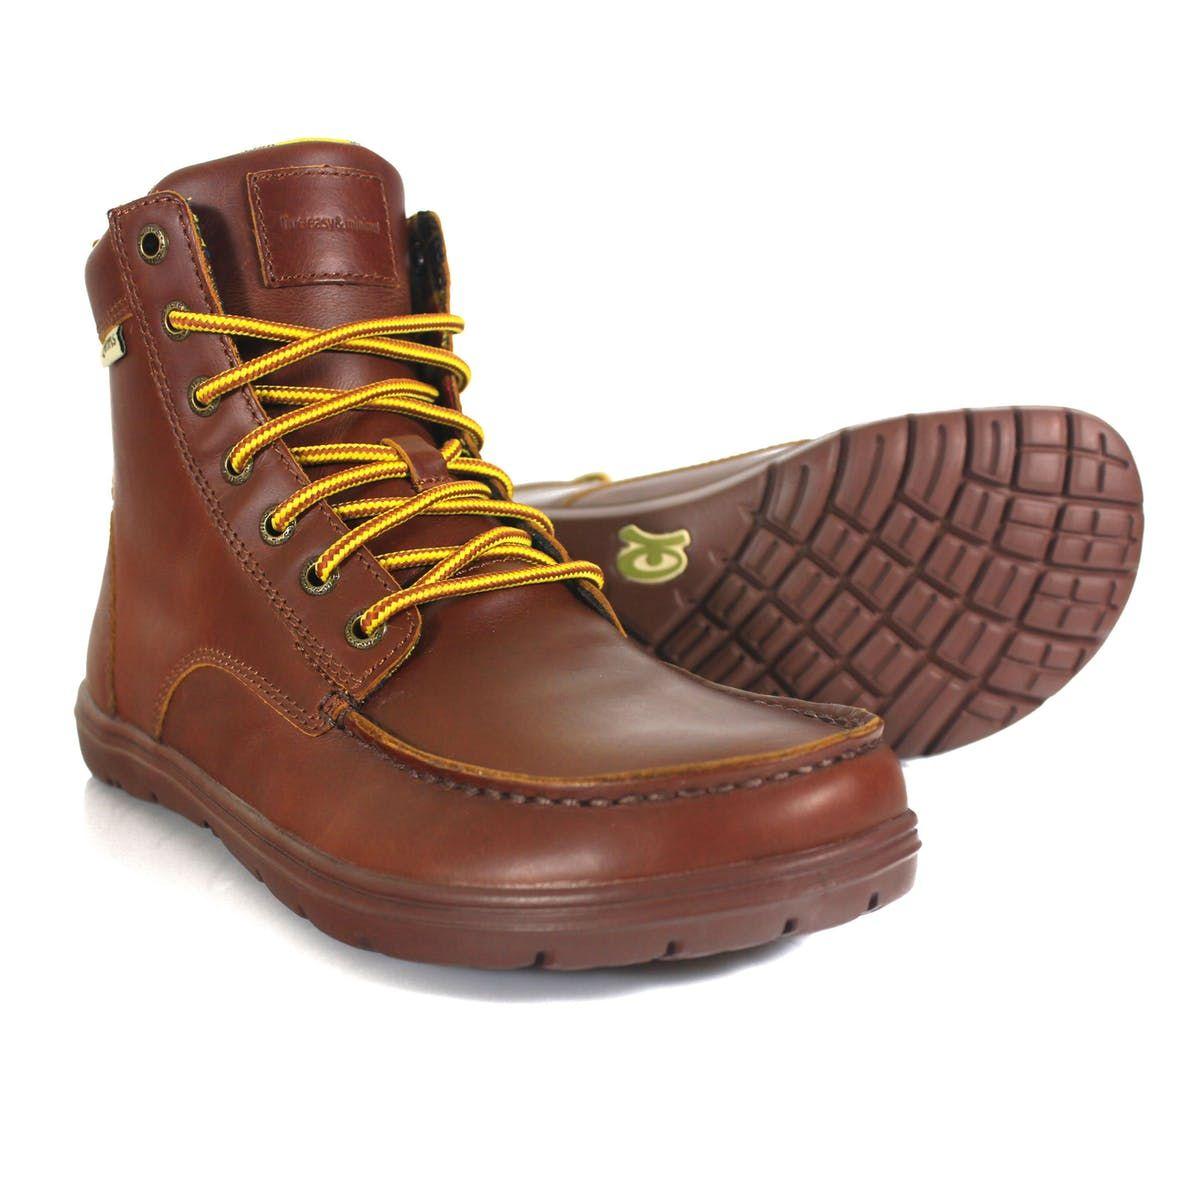 Womens Primal 2 | Hiking shoes women, Minimalist shoes